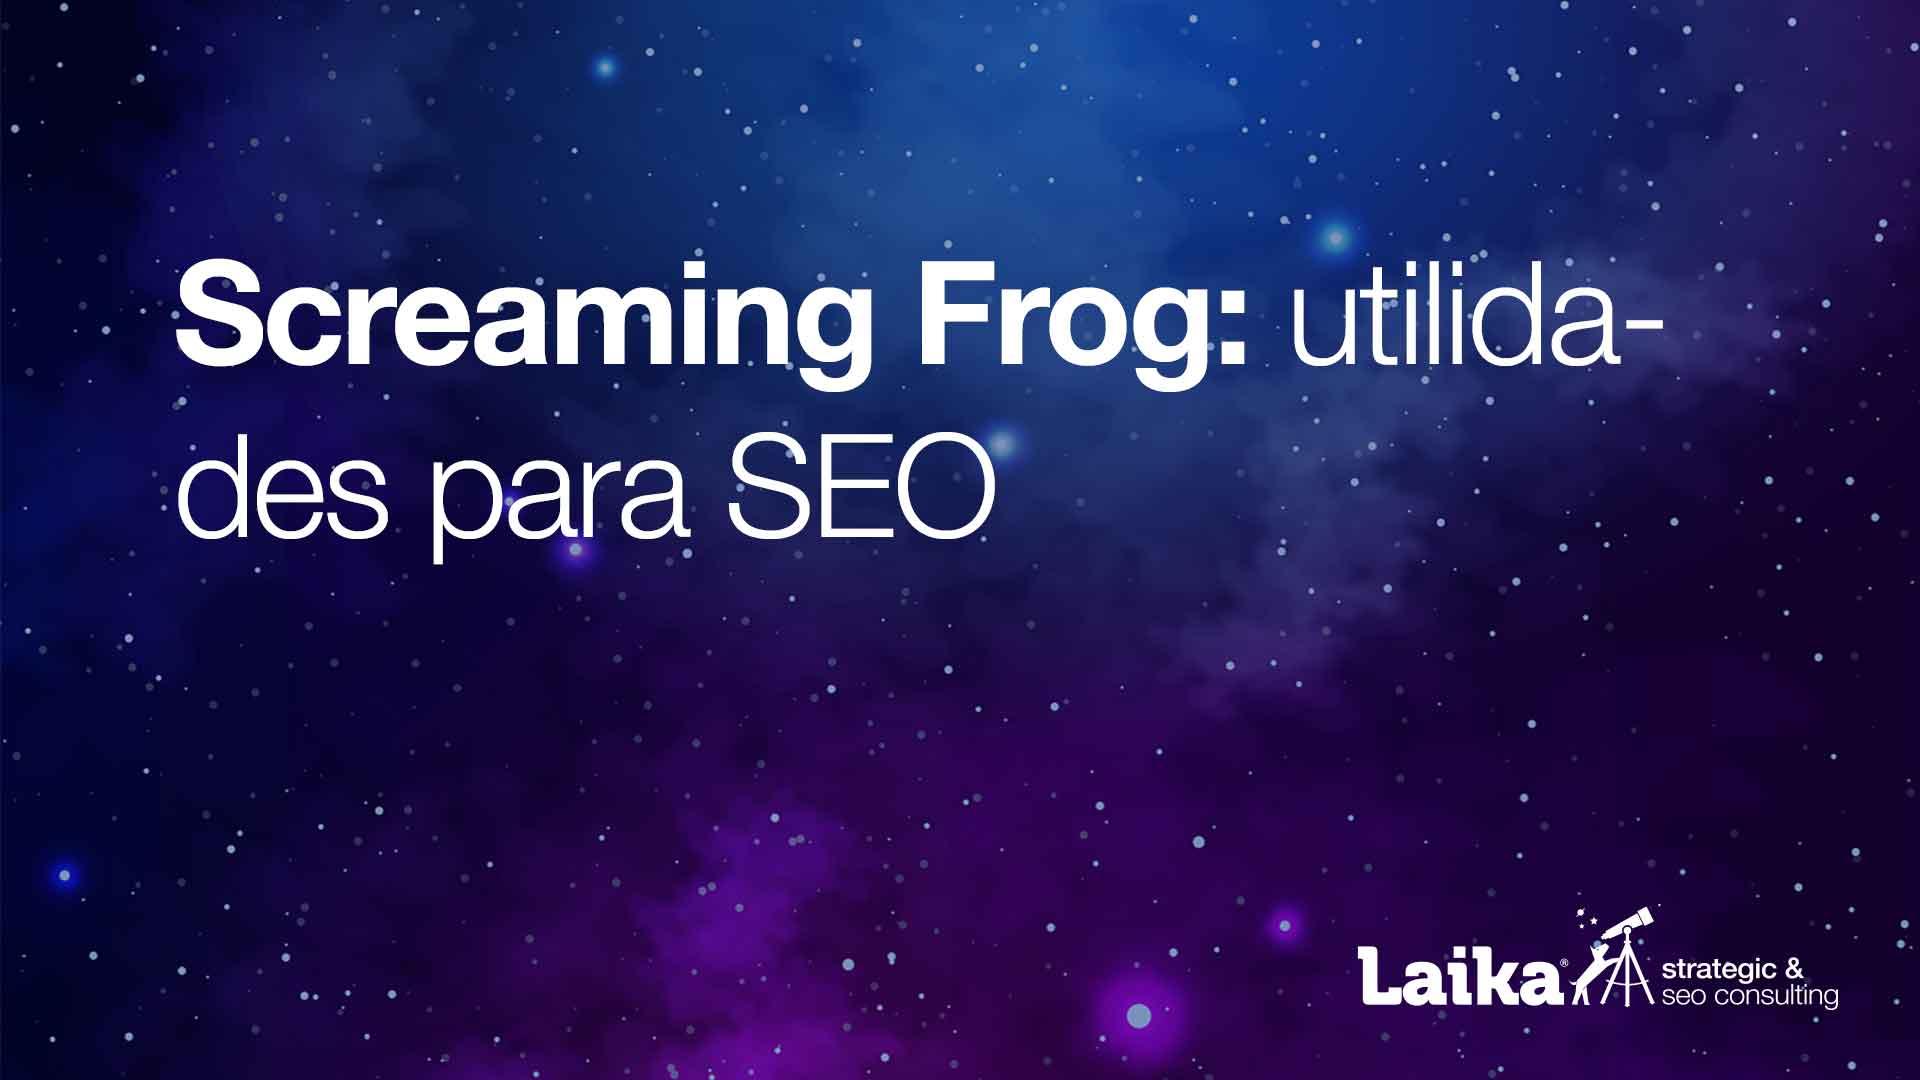 Screaming Frog: utilidades para SEO